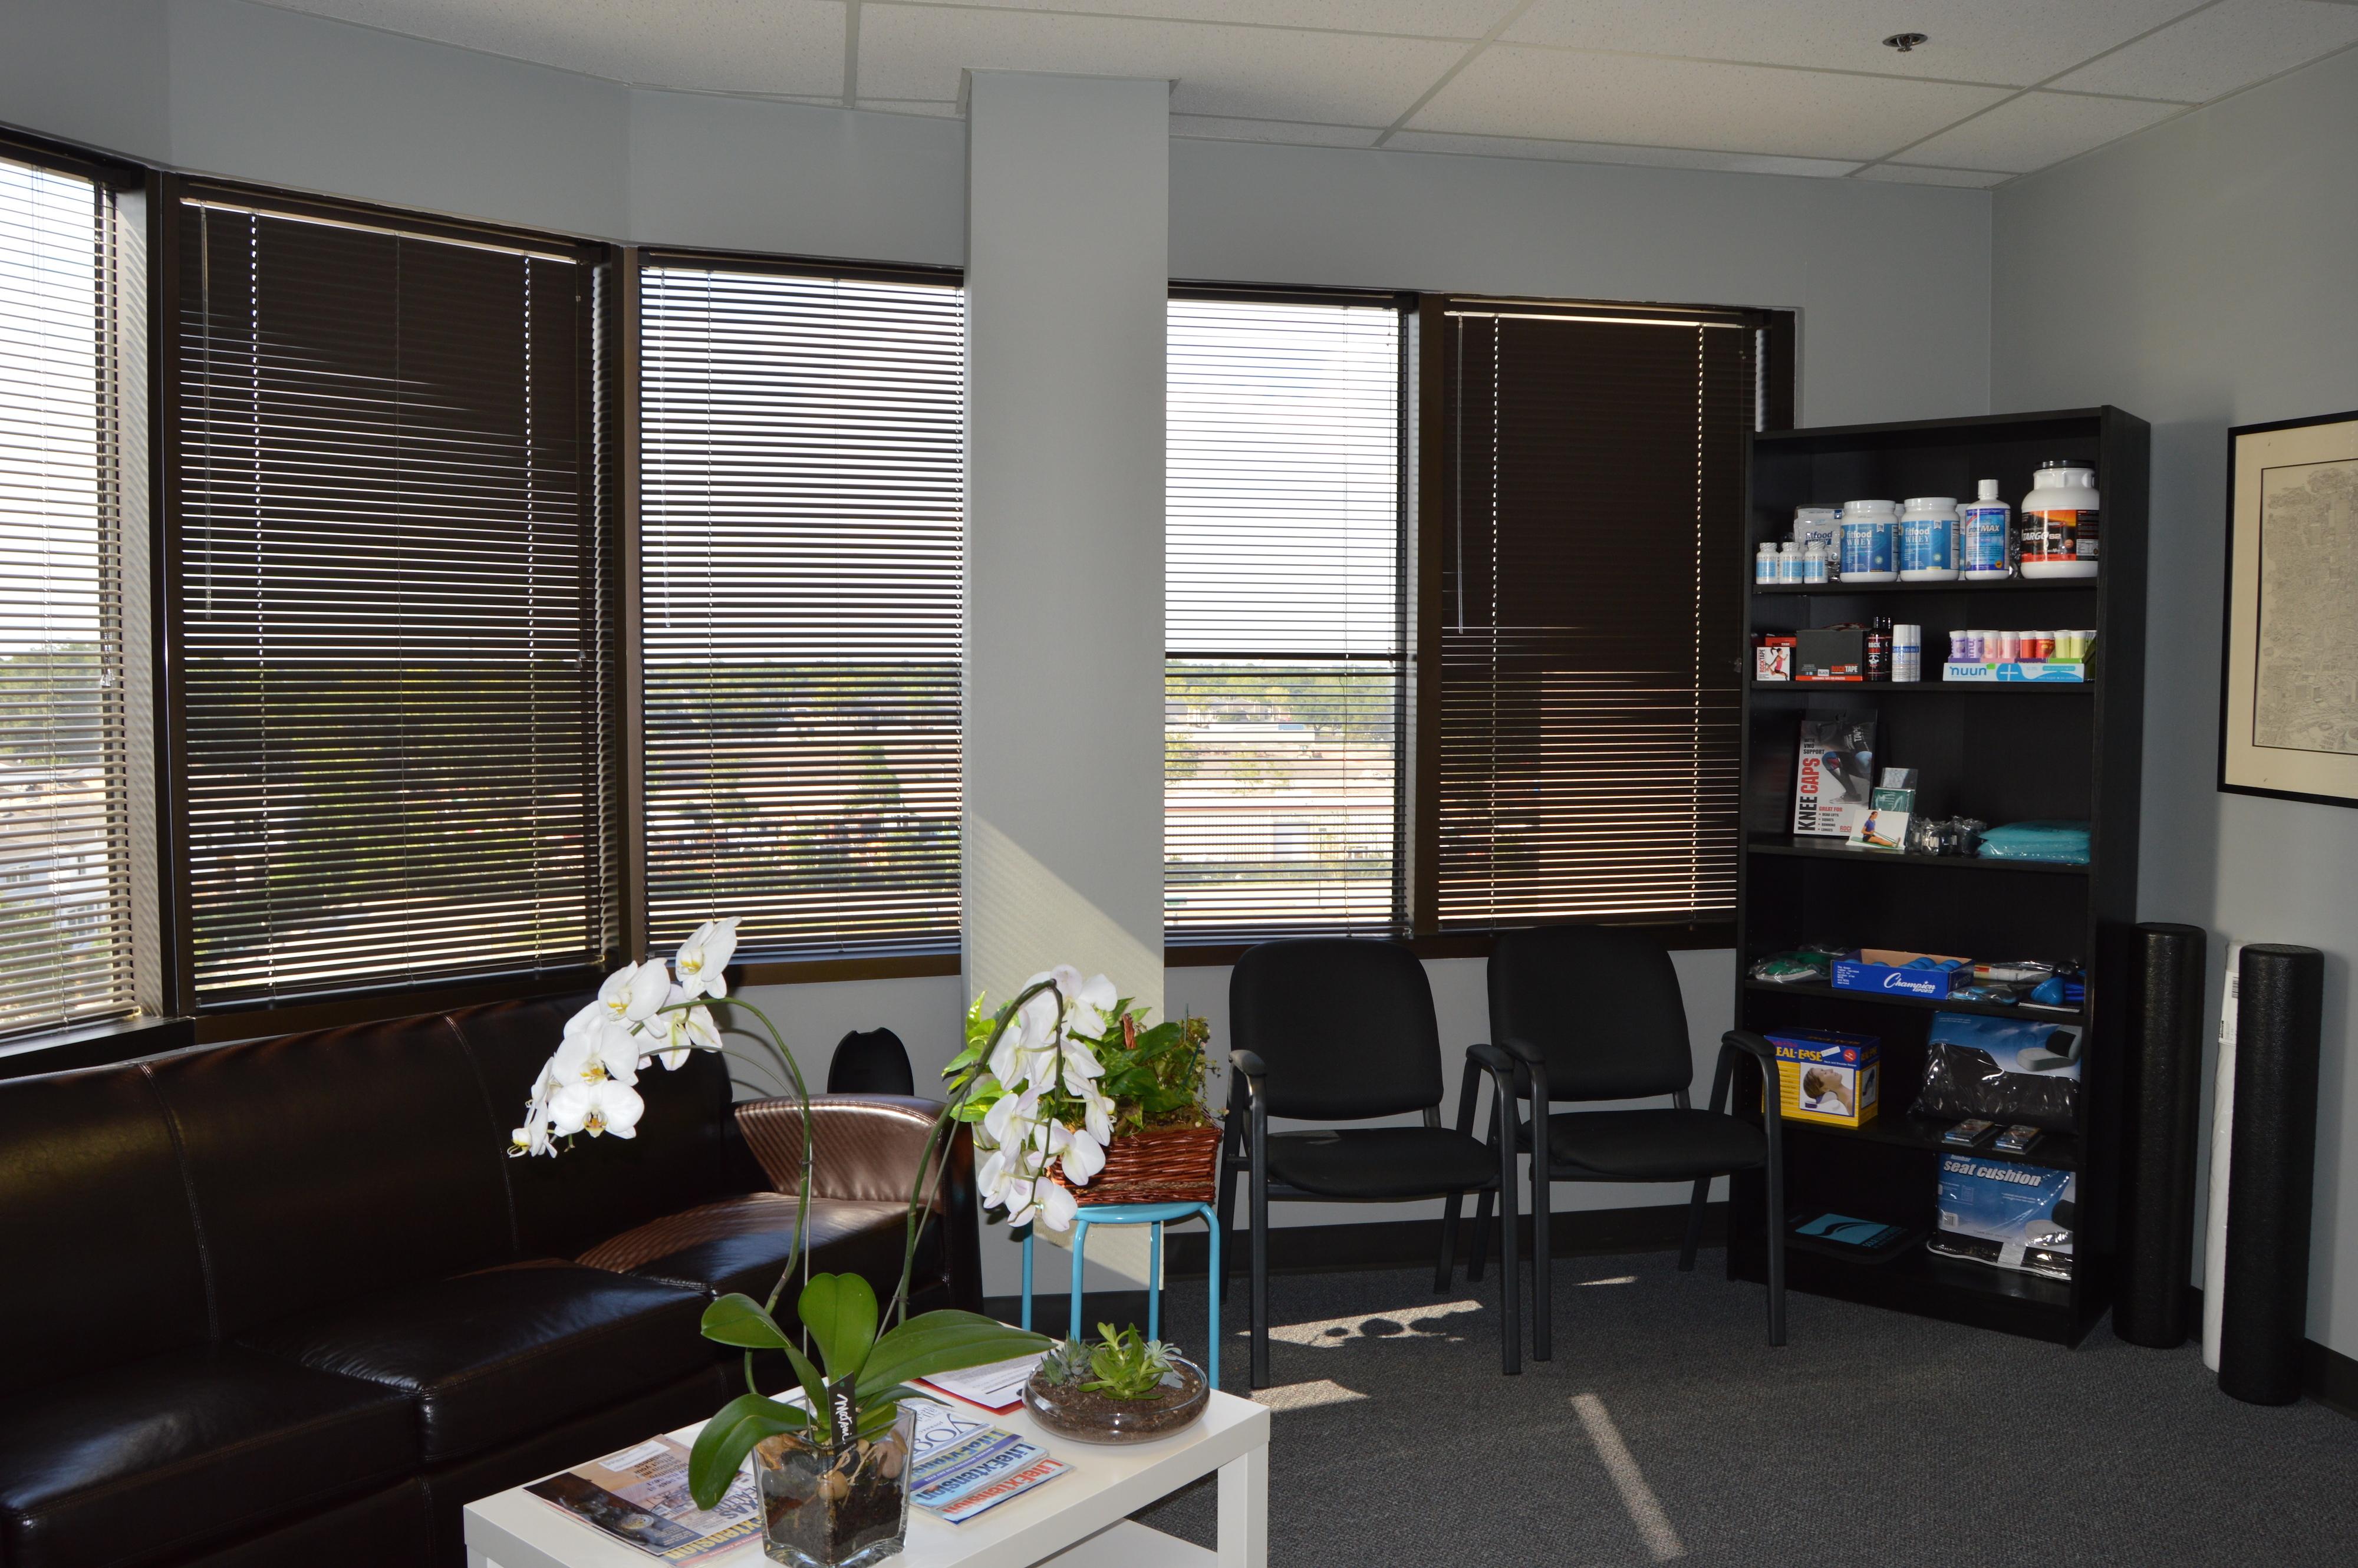 Canada Chiropractic In Houston Texas 77055 832 409